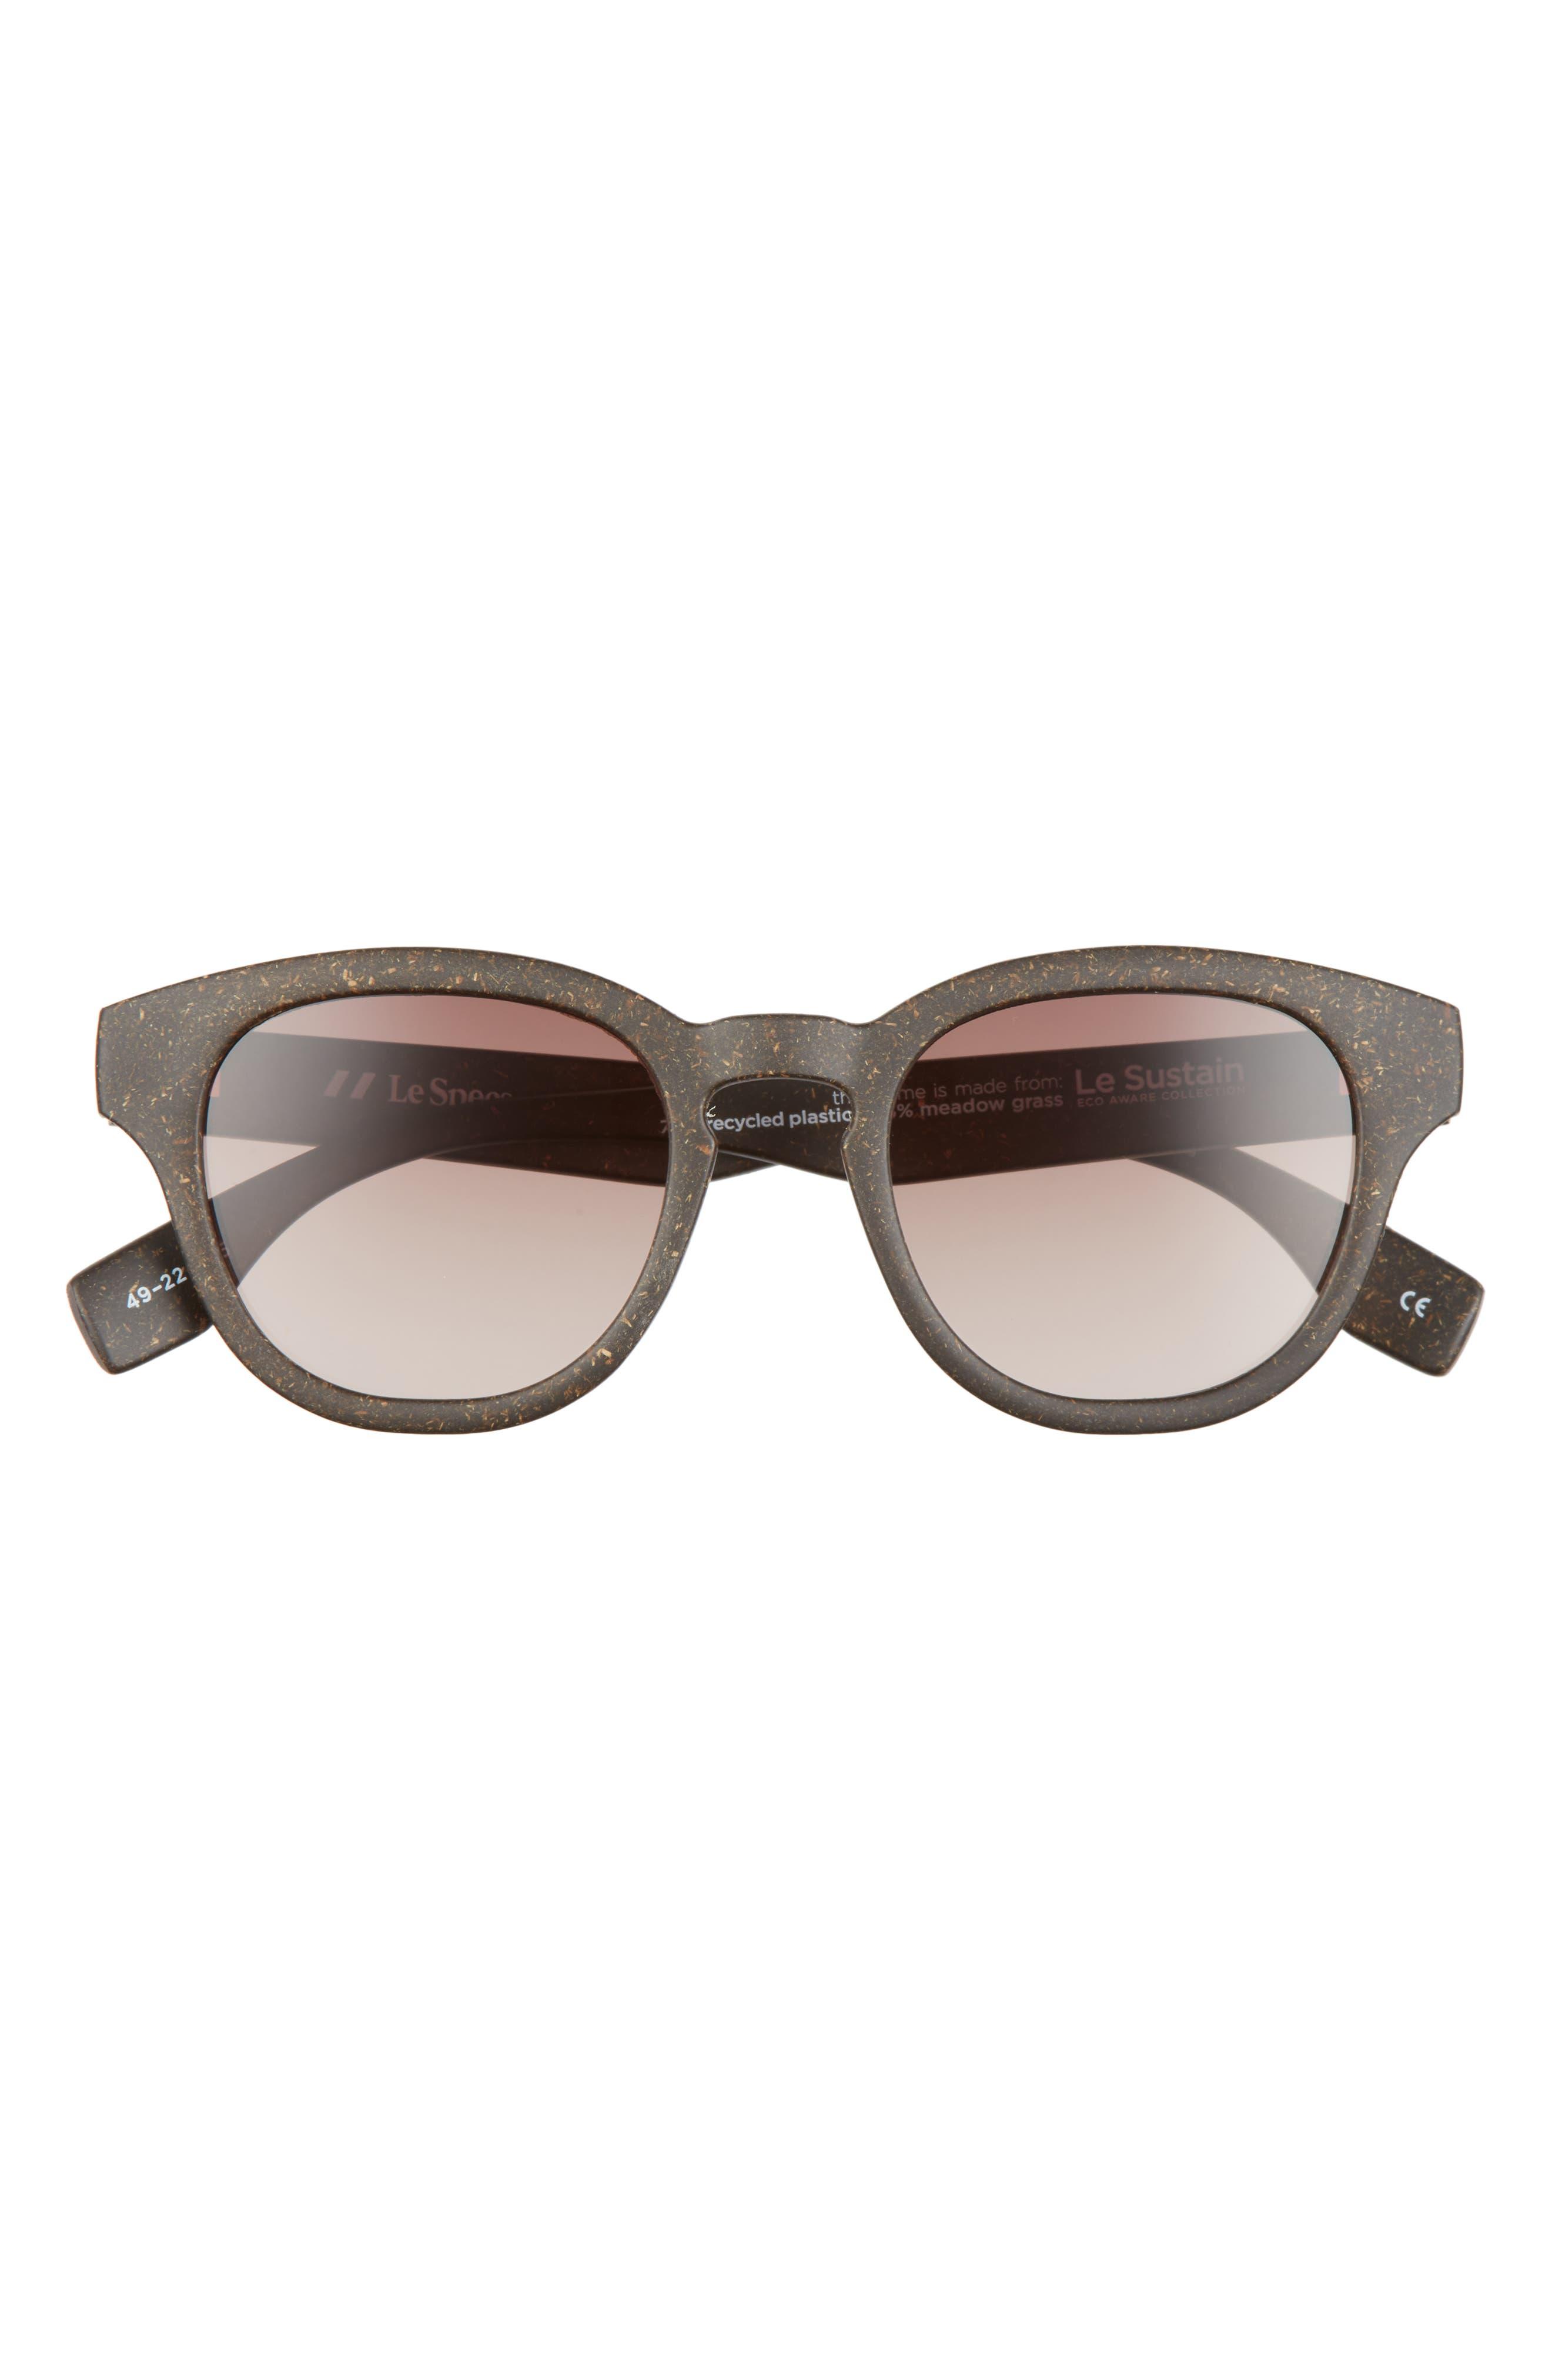 Grass Band 49mm Polarized Round Sunglasses